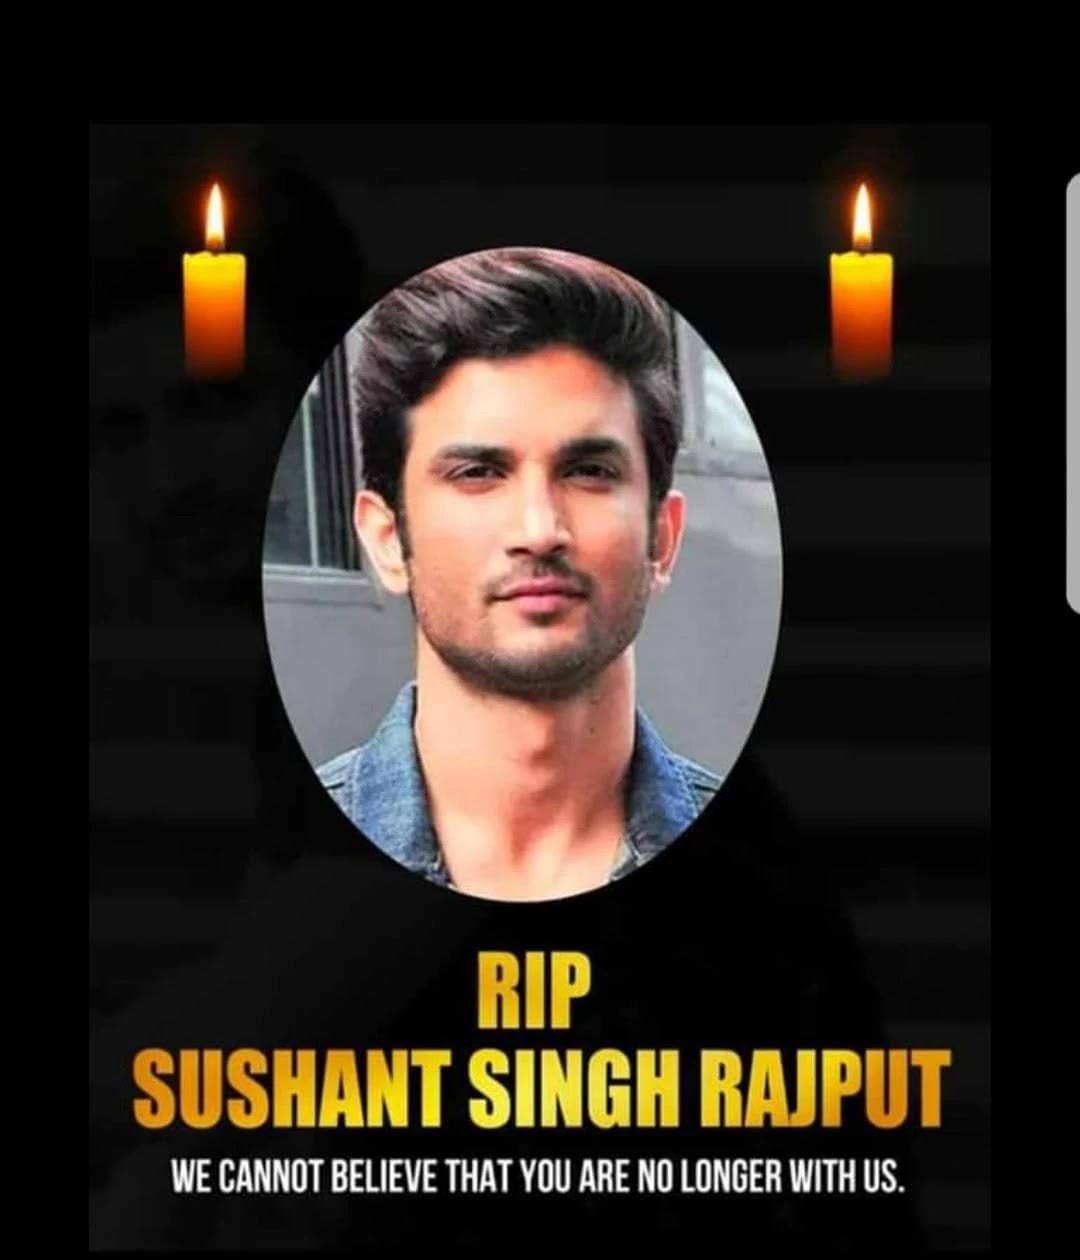 Post-mortem-report-of-Sushant-Singh-Rajput-came-Santali-news